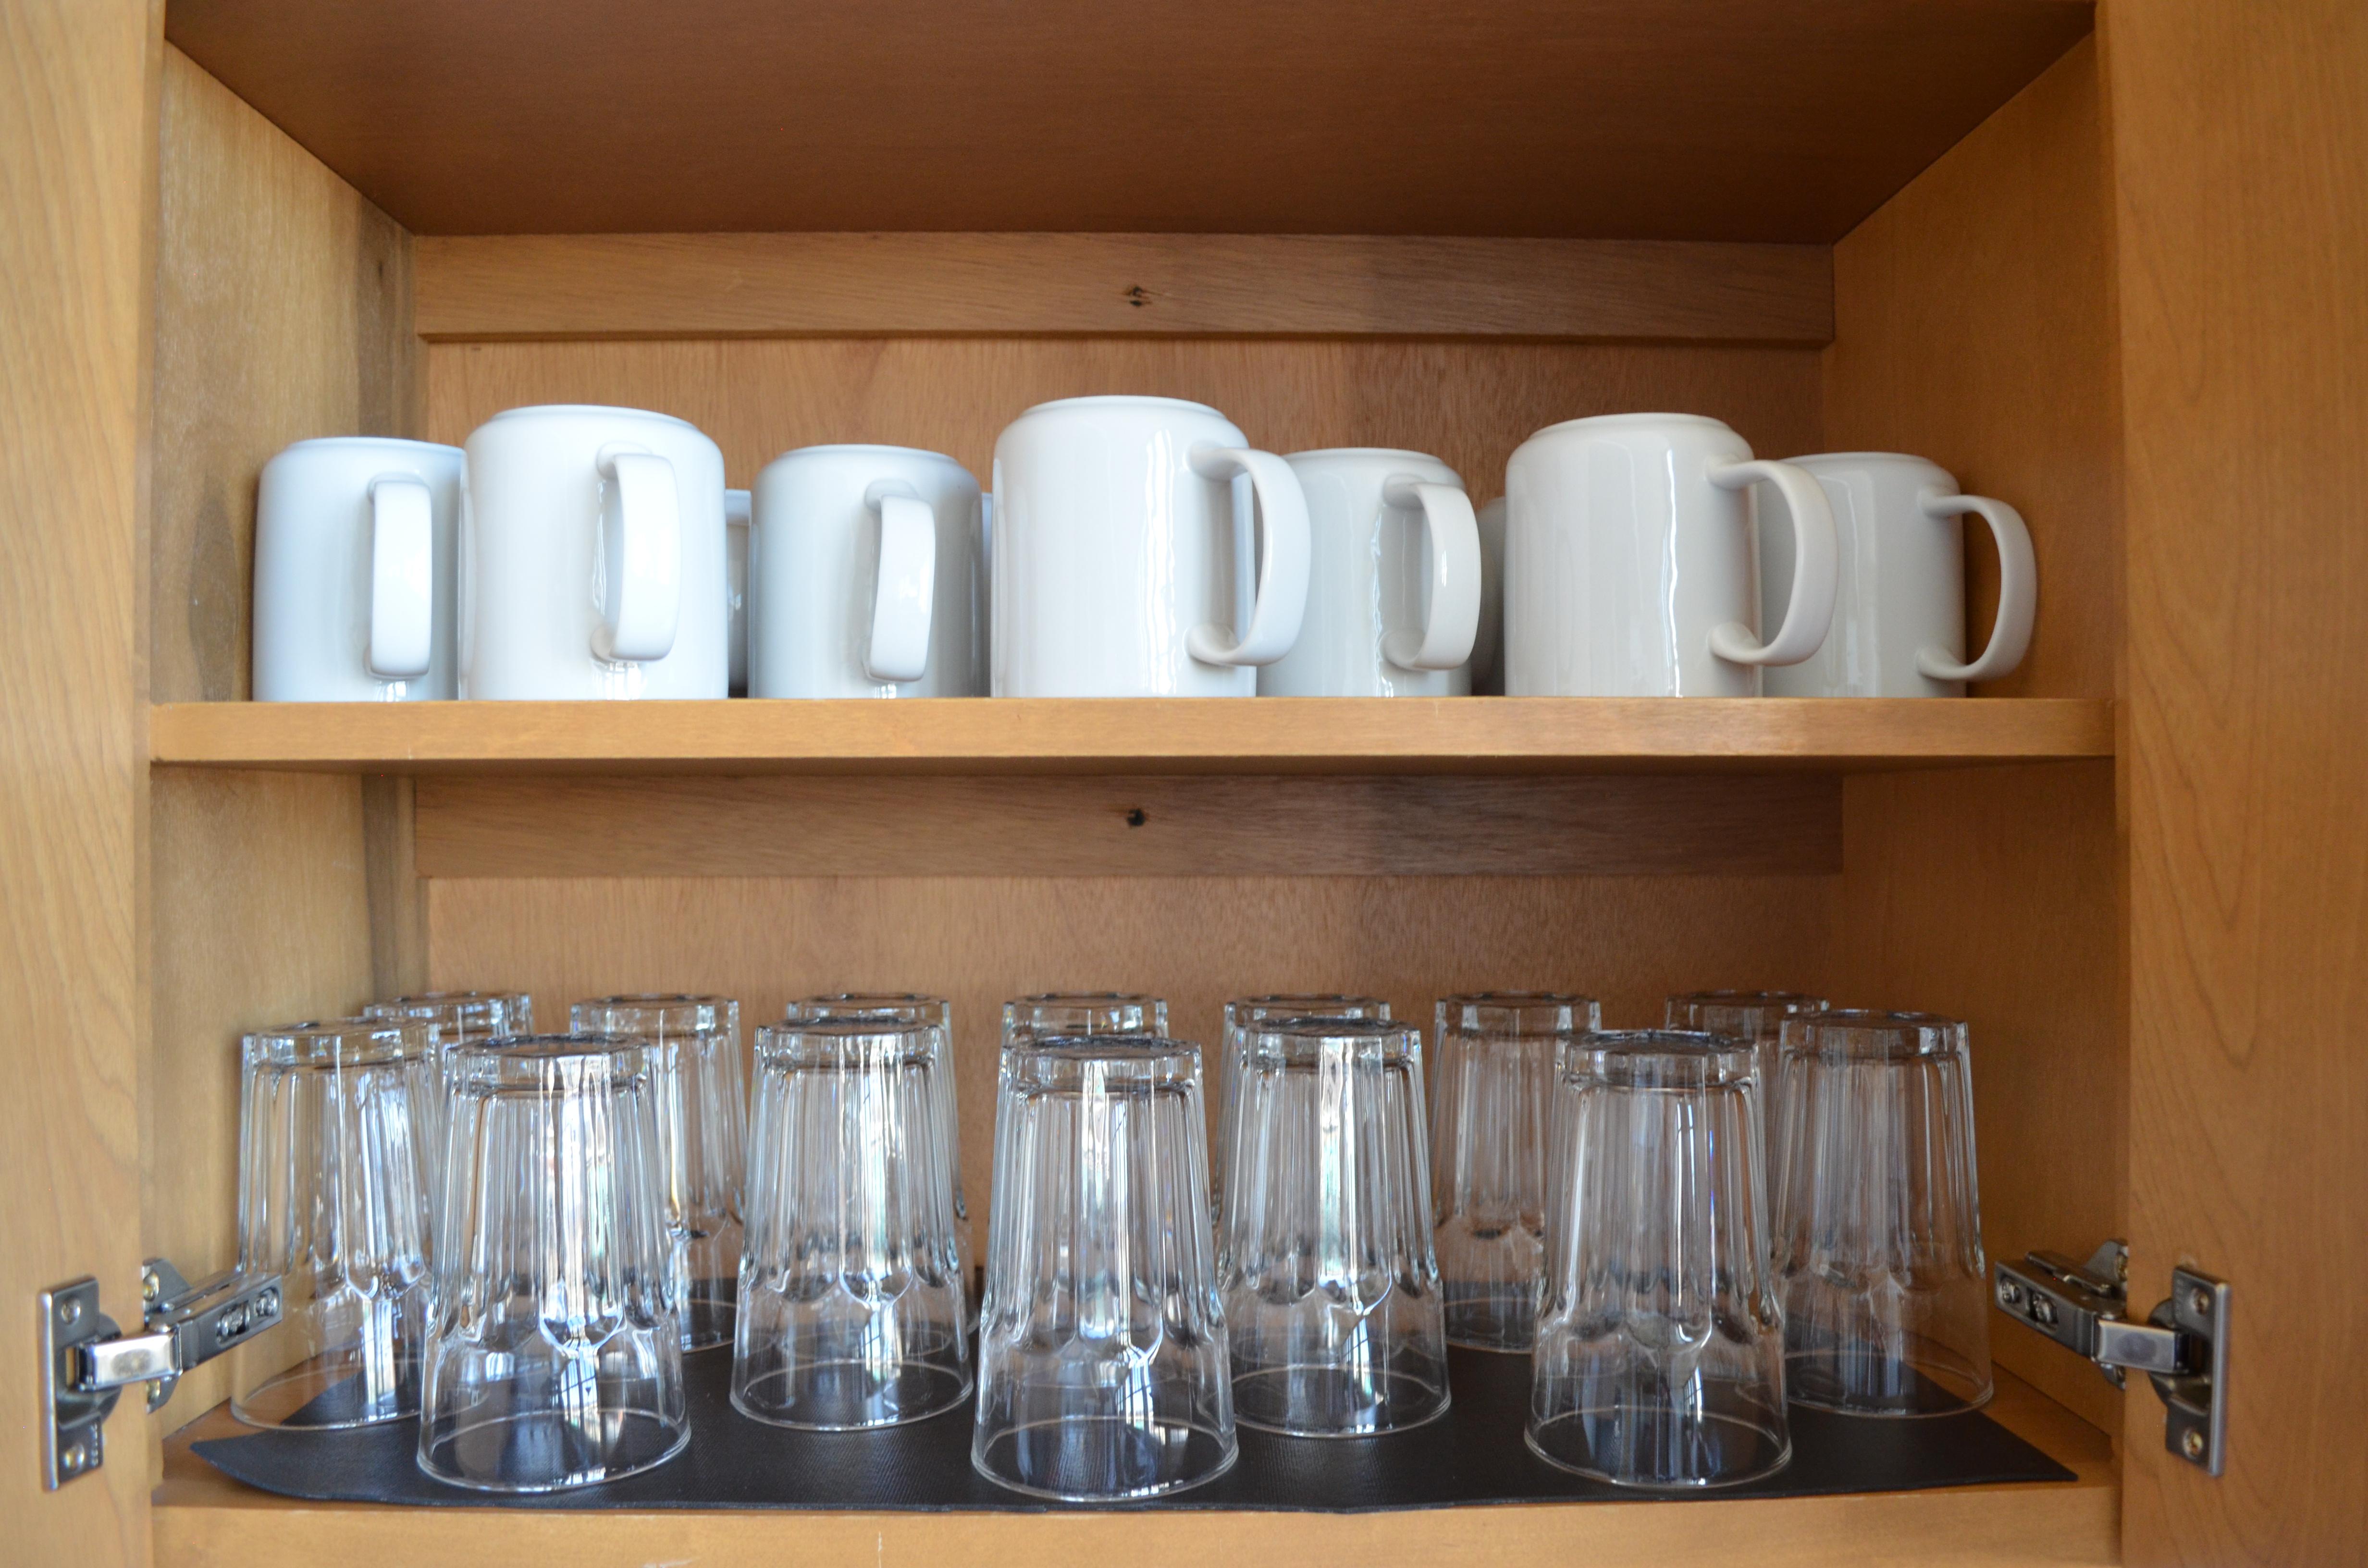 Coffee Mugs Glassware Kitchen - Loft Reverie Amenities